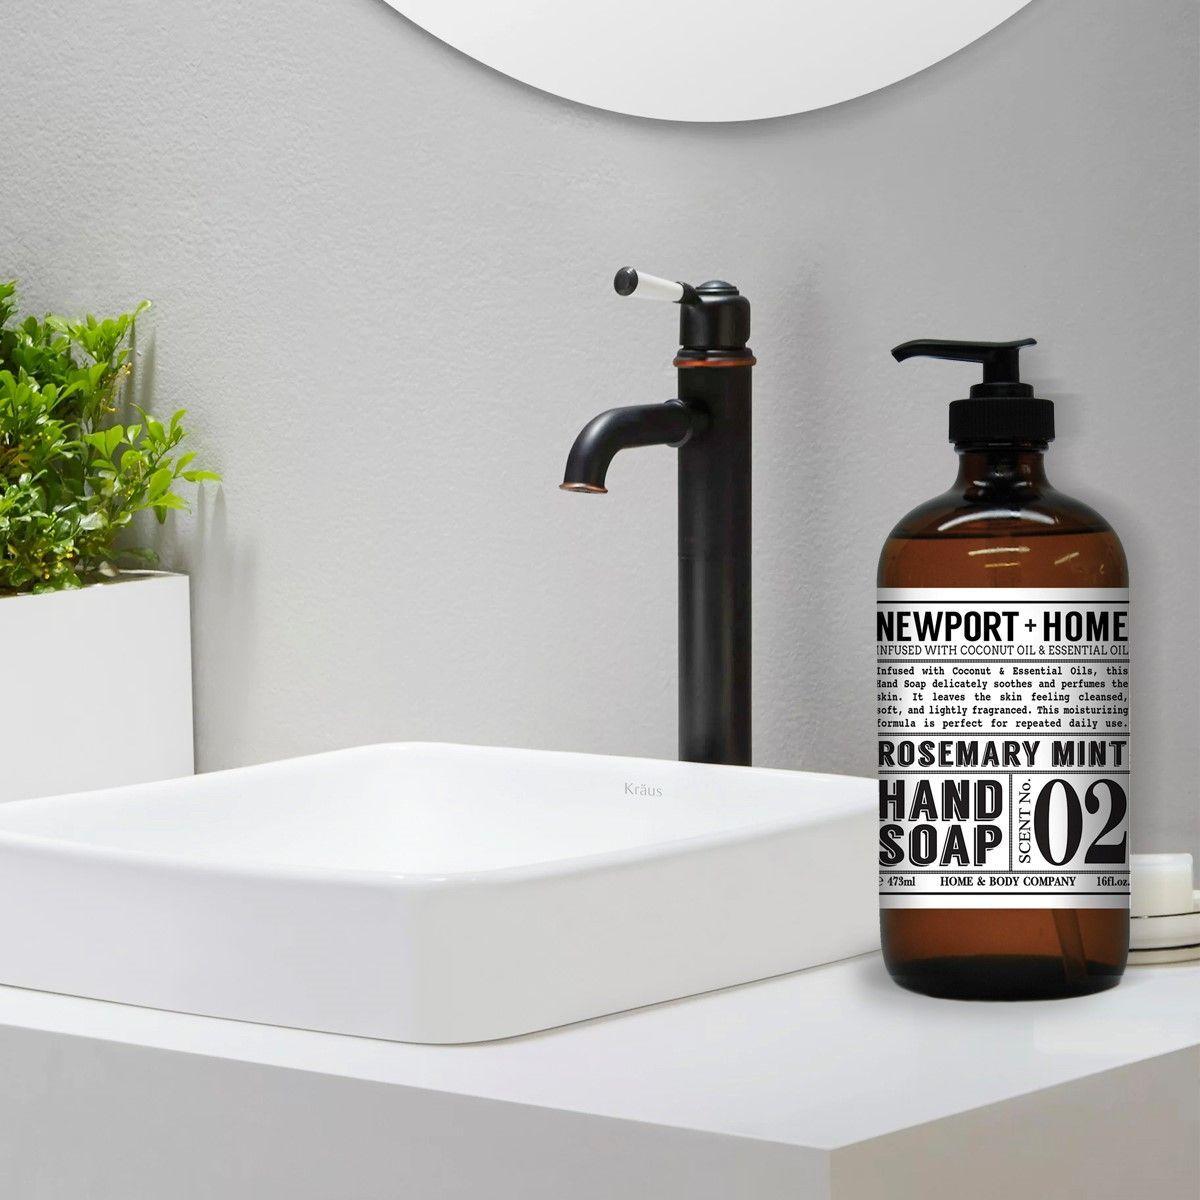 Newport hand soap bottle on top of sink